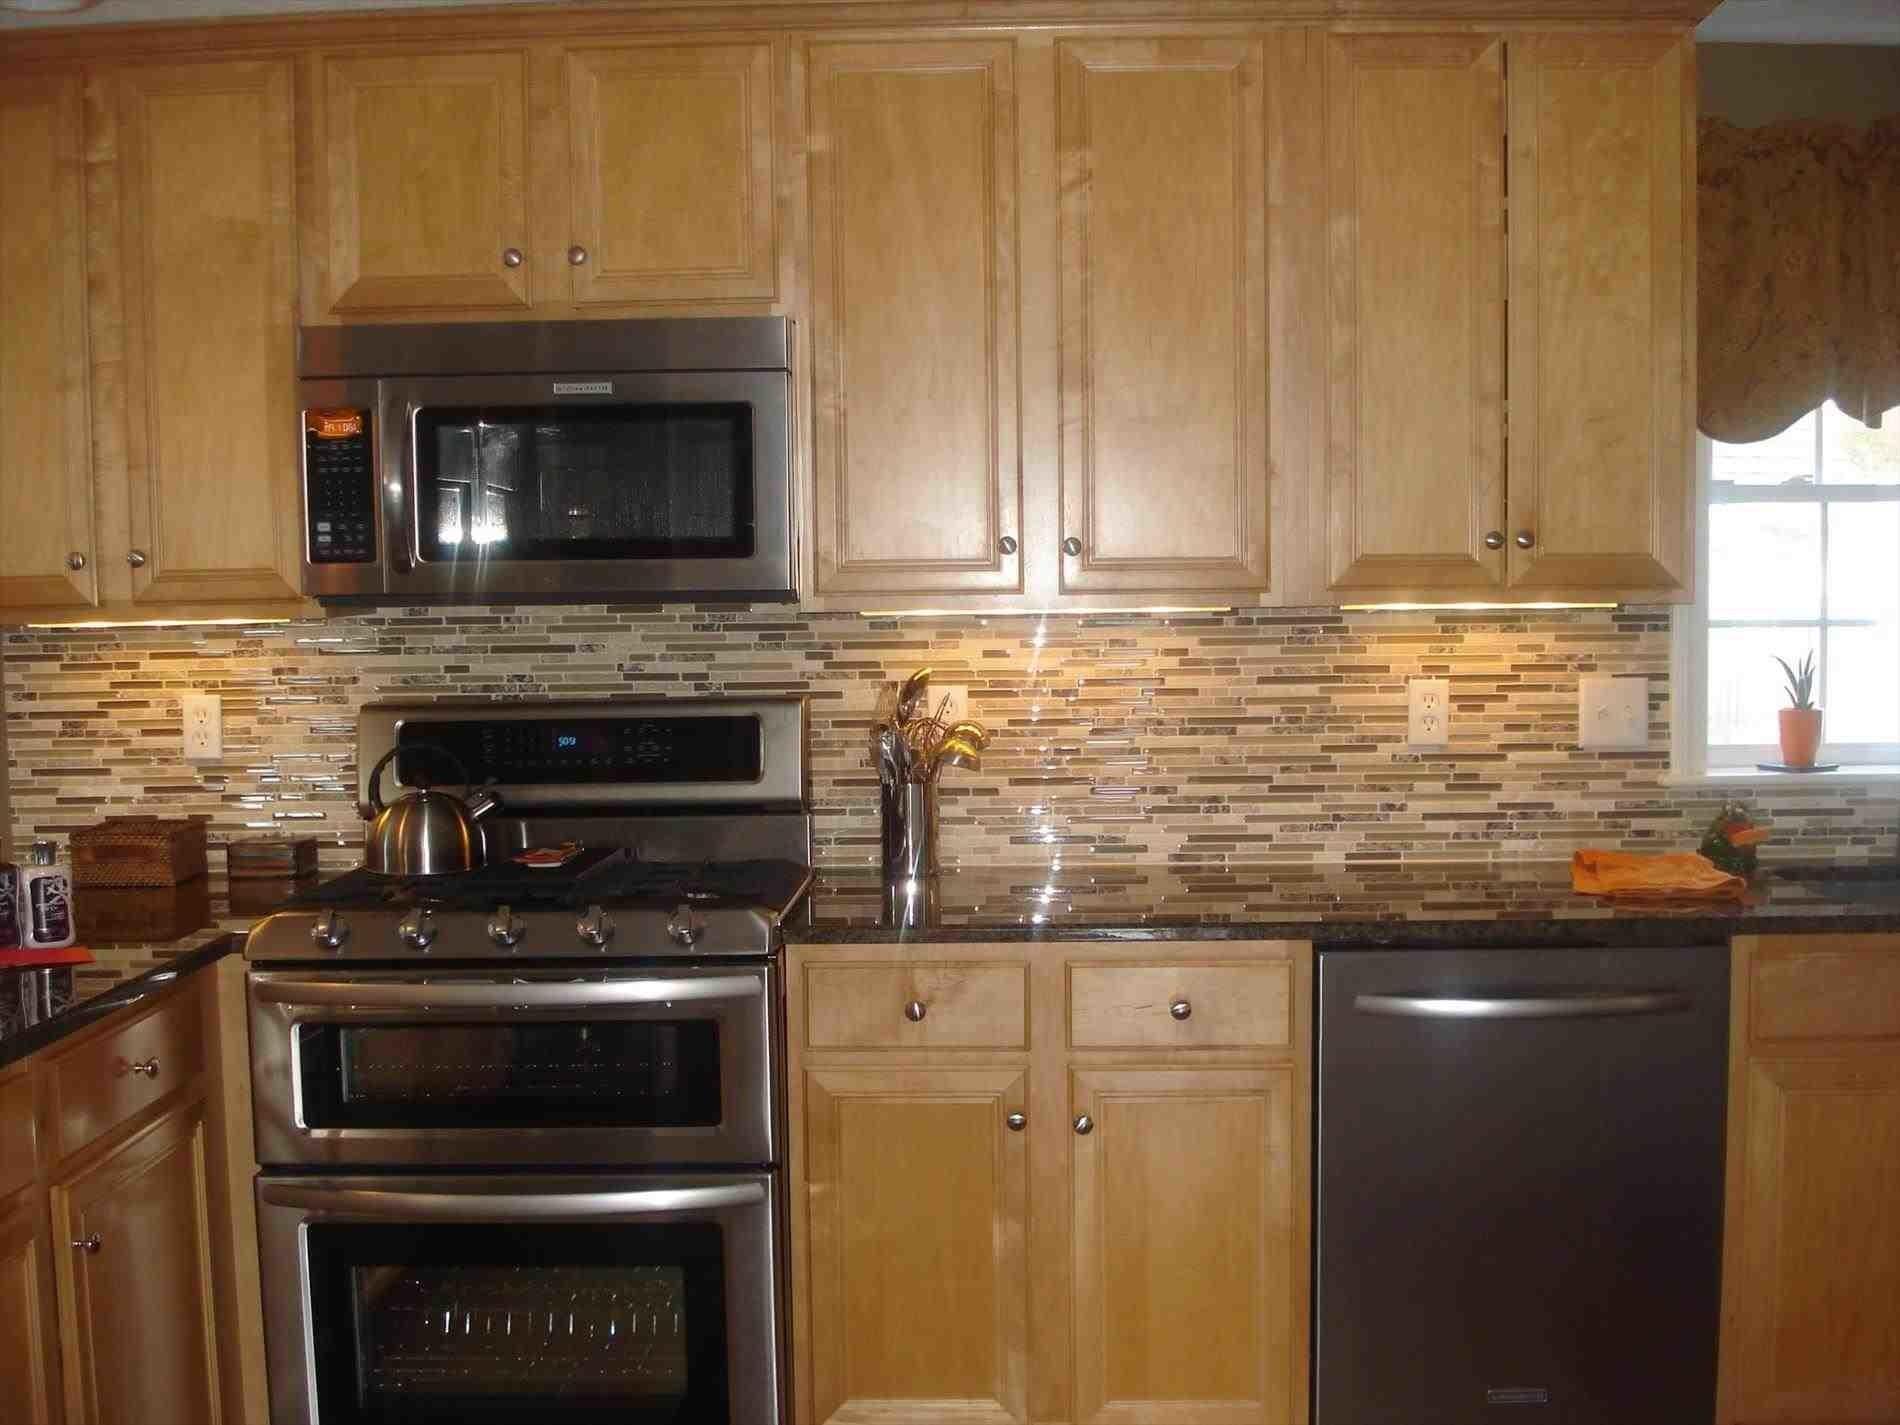 Kitchen Backsplash Ideas Dark Oak Cabinets - Decoratorist ... on Backsplash Ideas For Dark Cabinets And Light Countertops  id=62788